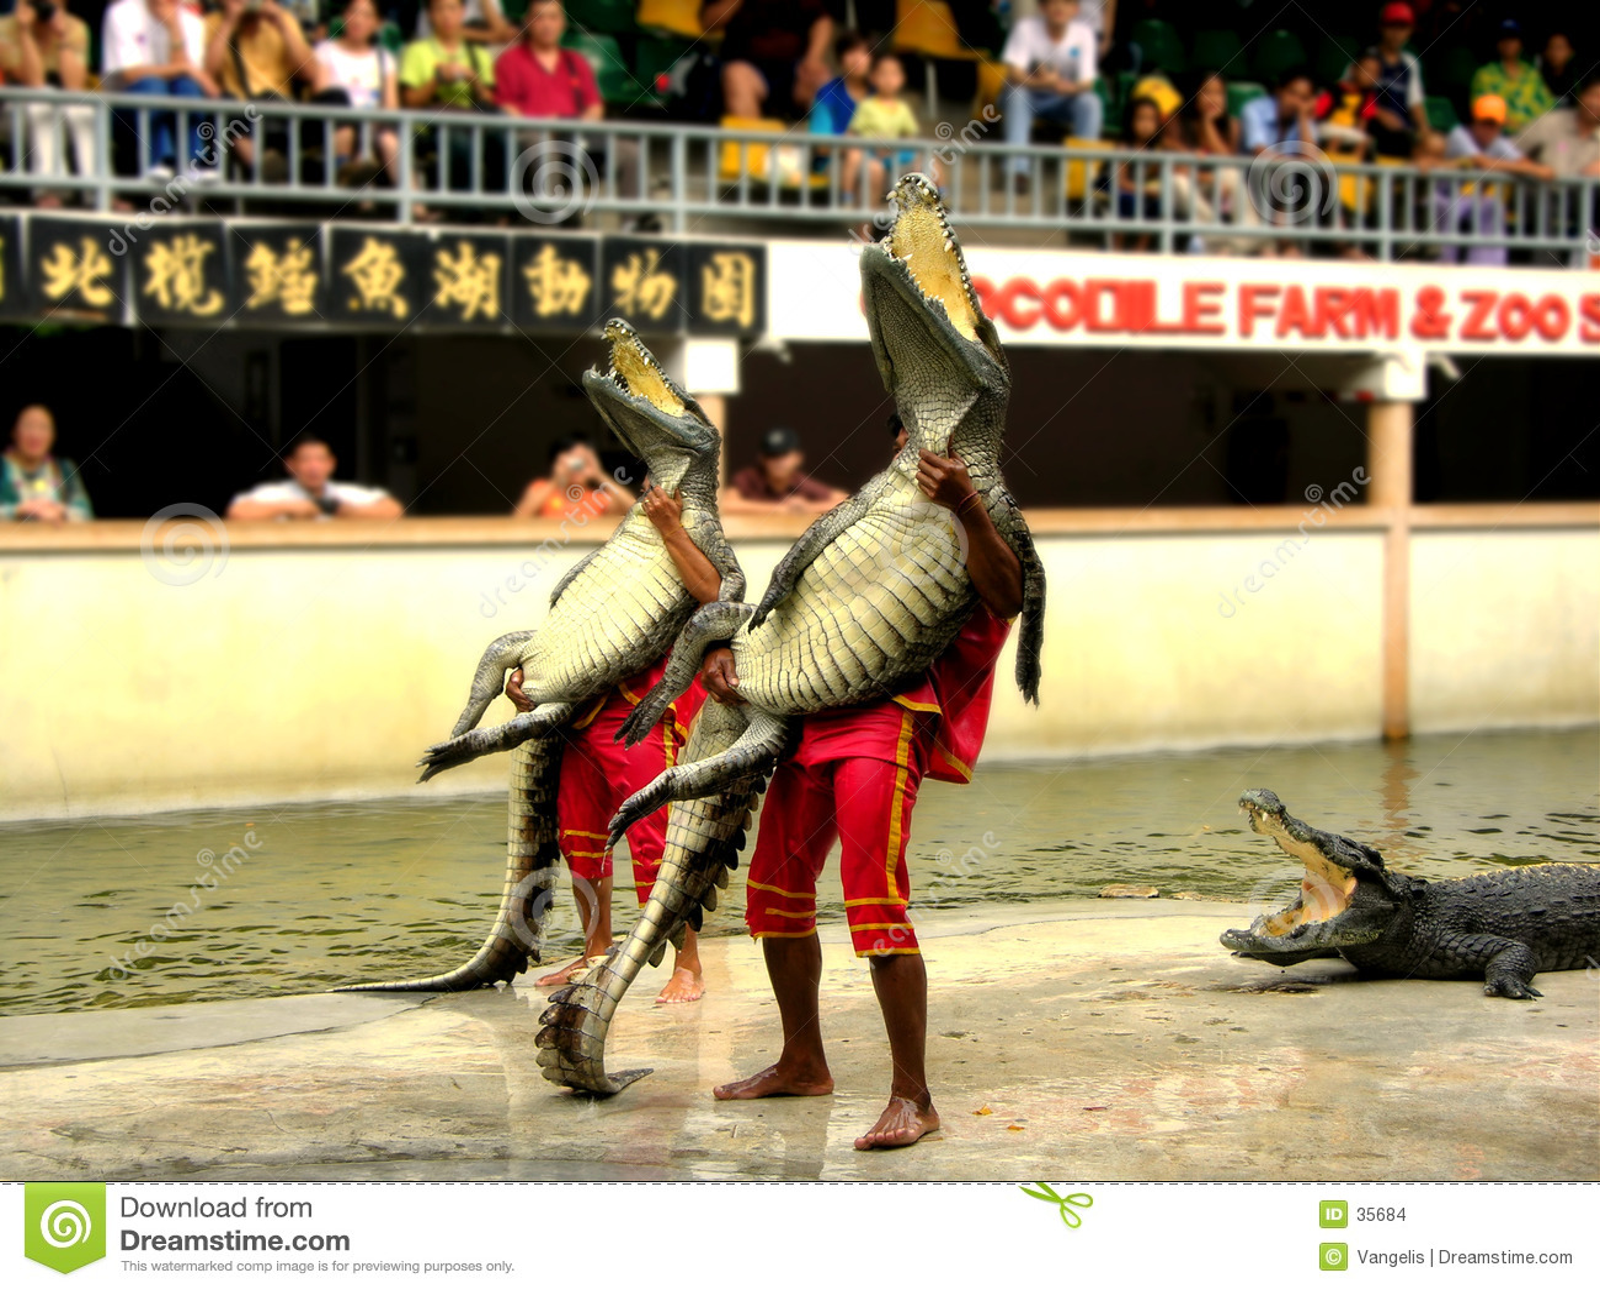 Samutprakan Crocodile Farm and Zoo 7